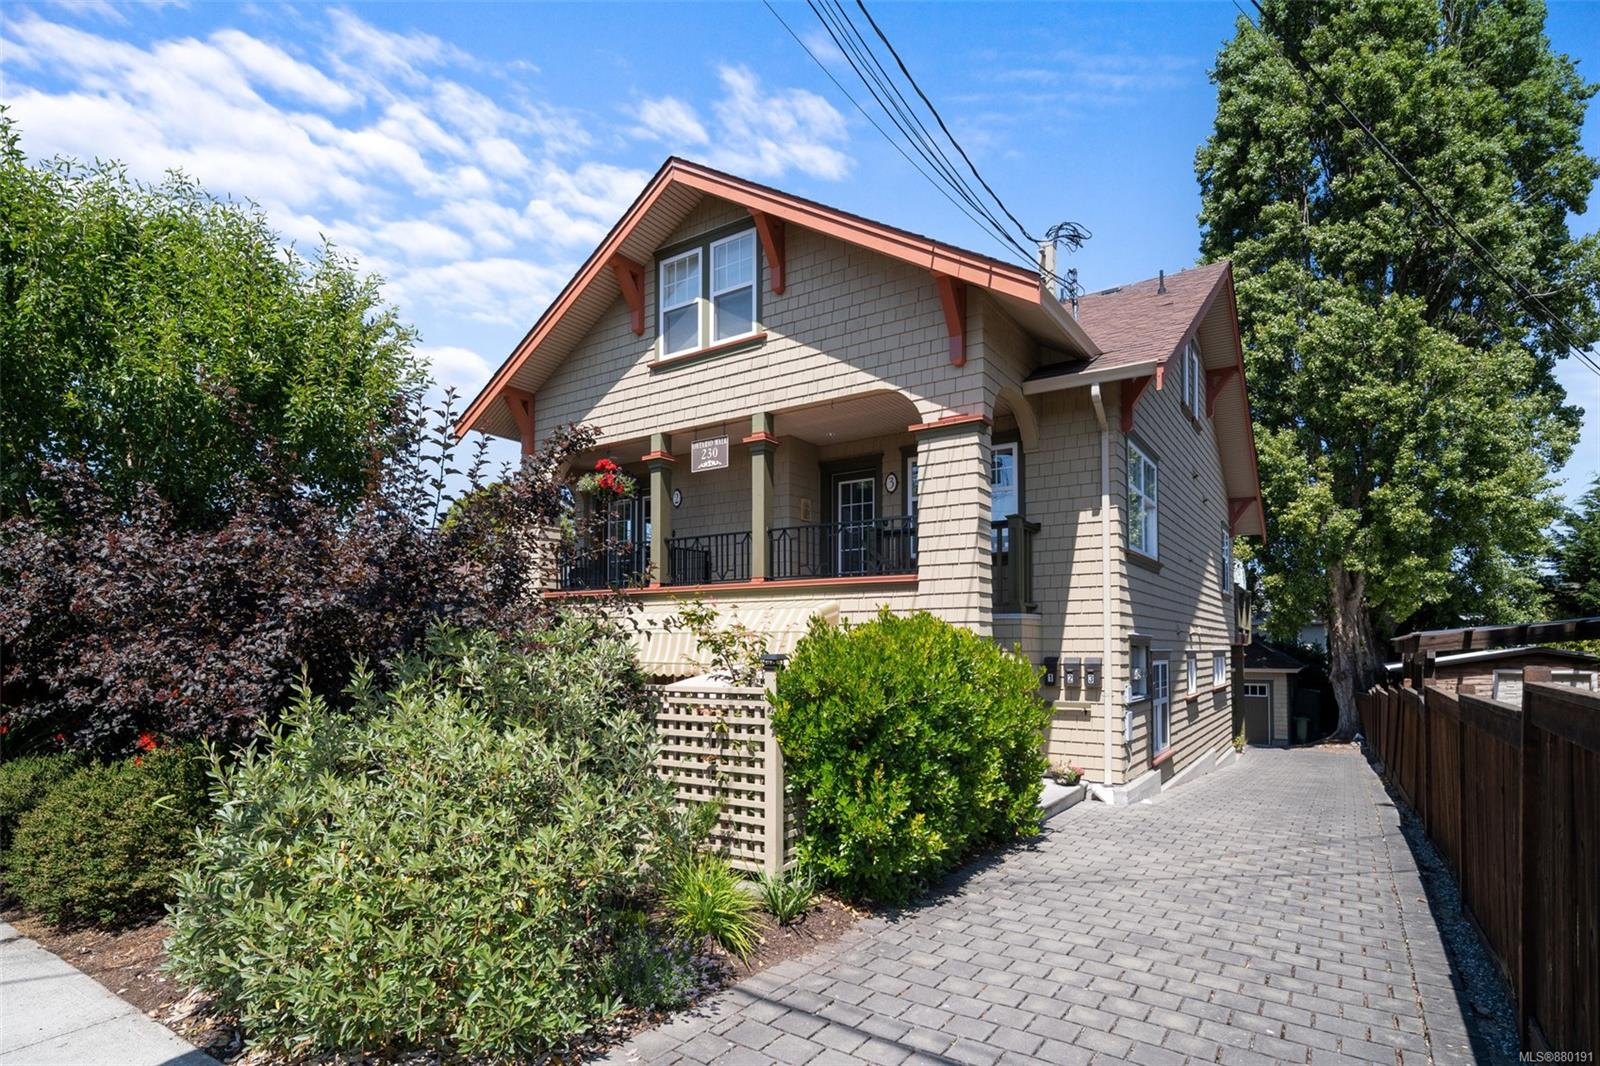 1 - 230 Ontario Street, James Bay, Victoria photo number 2